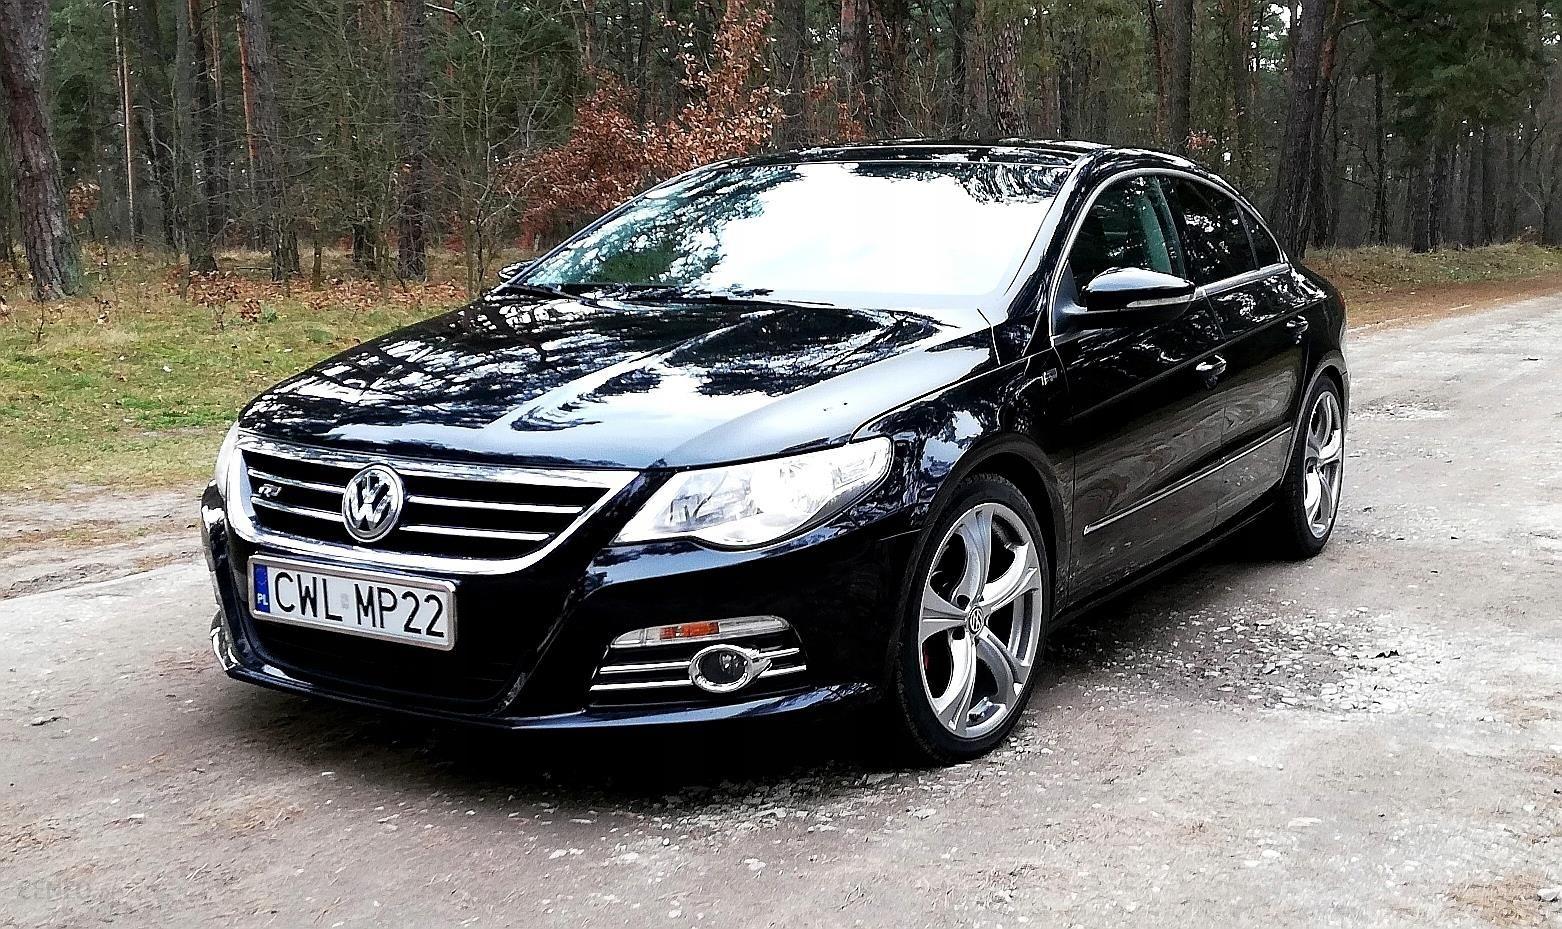 Volkswagen Passat Cc 2 0 Opinie I Ceny Na Ceneo Pl